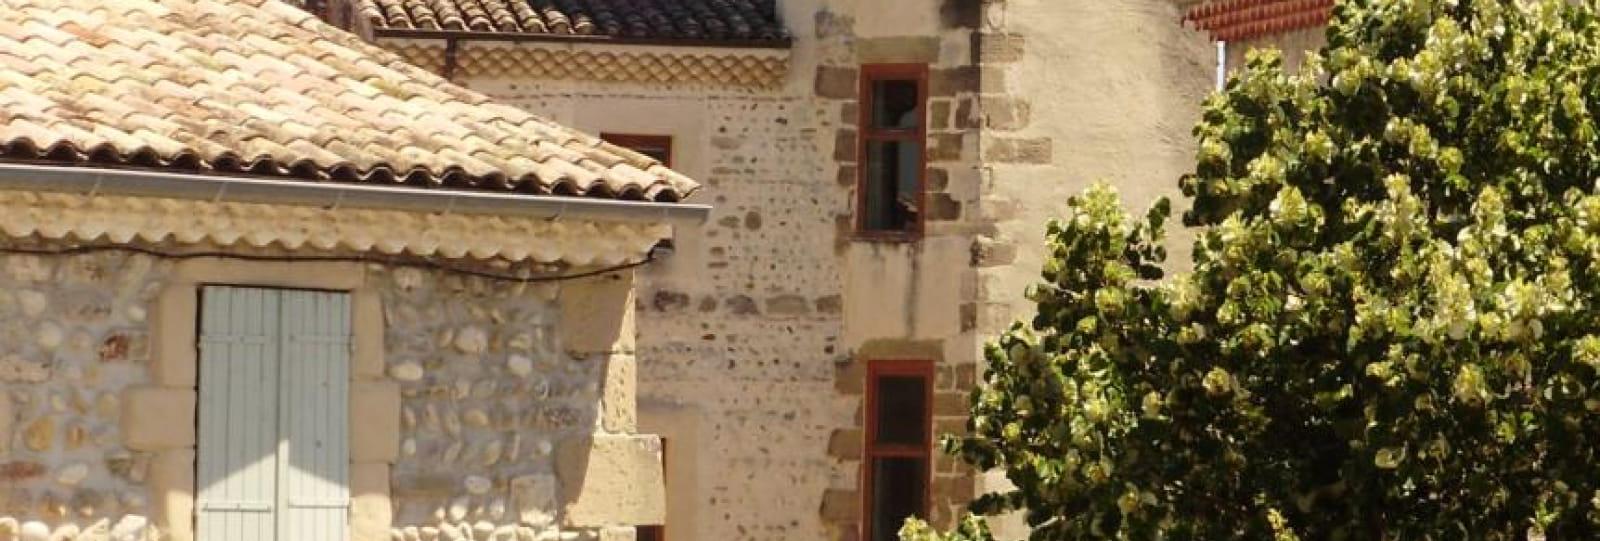 Tour Diane de Poitiers